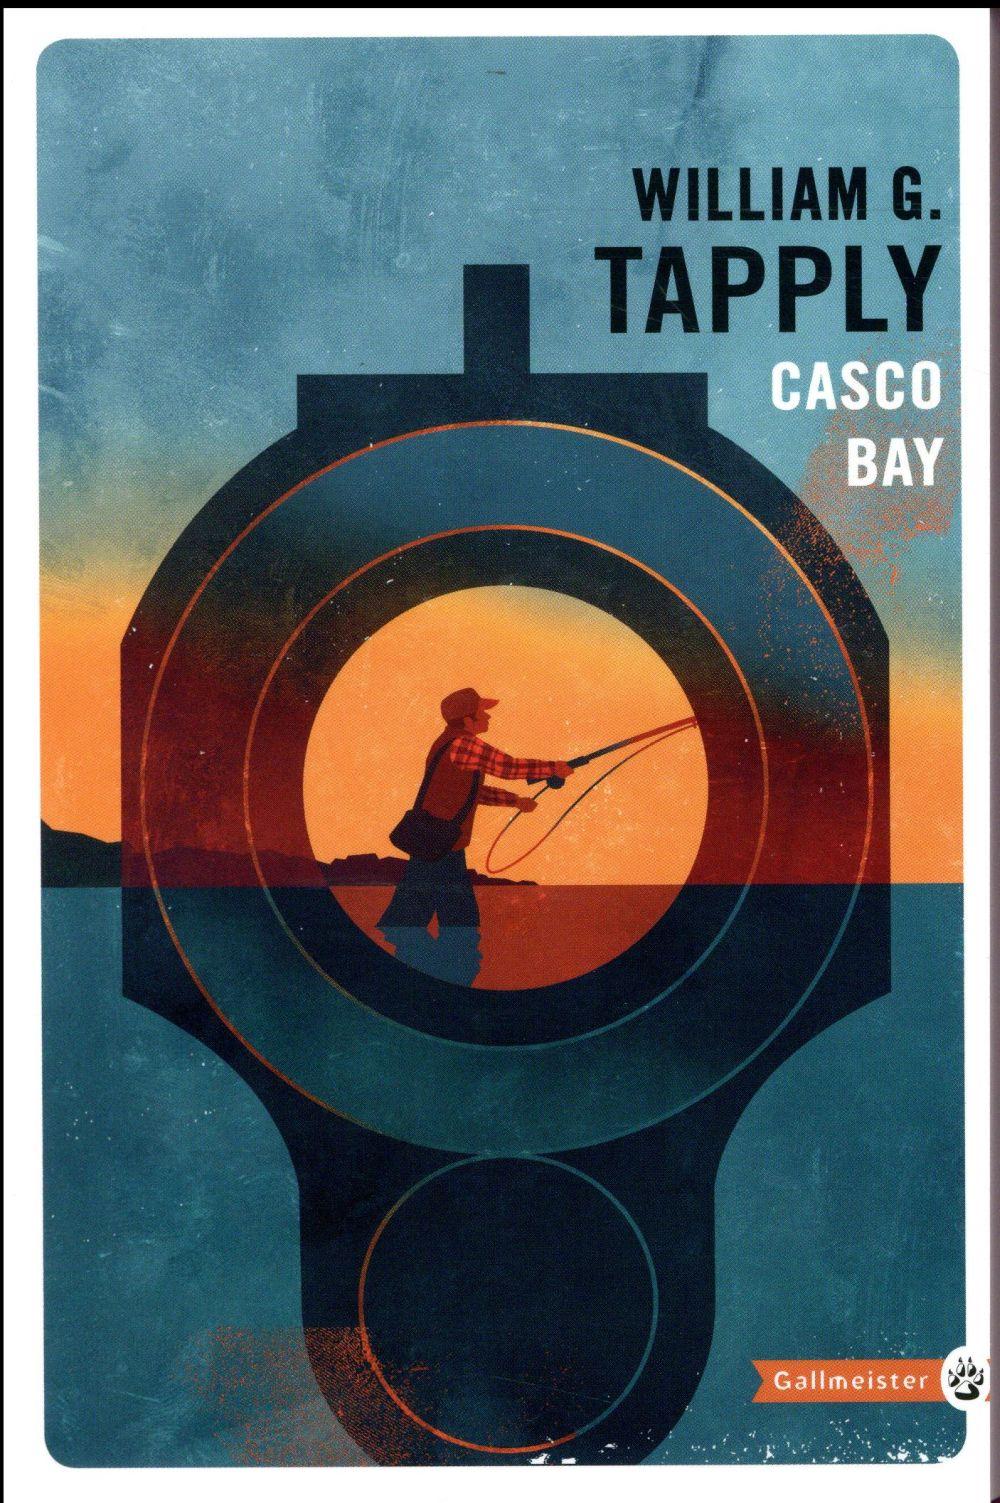 CASCO BAY NED Tapply William G. Gallmeister